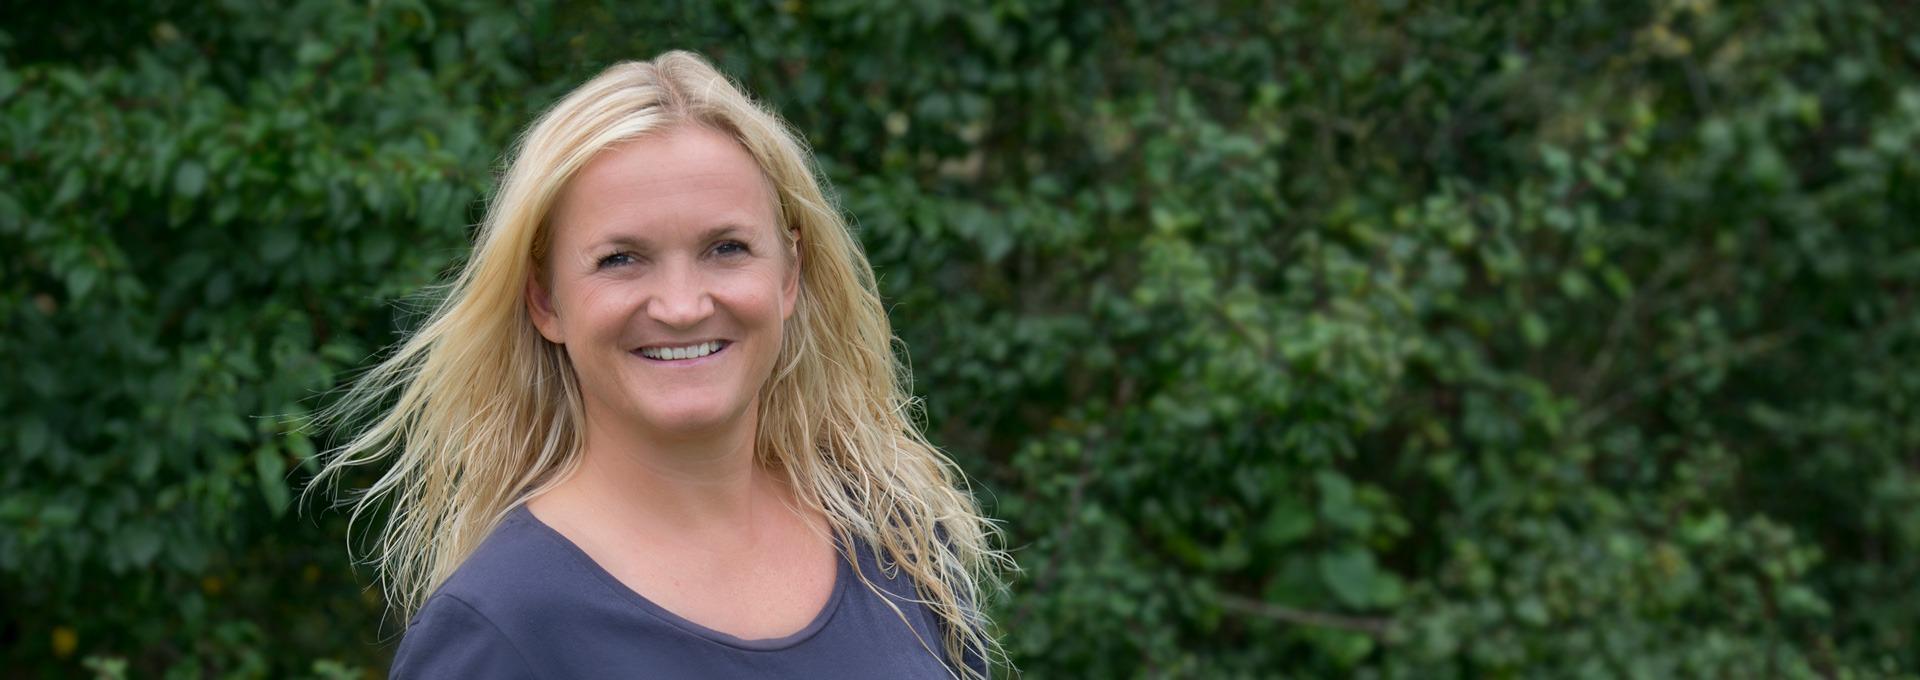 Annette Spangsberg - biodynamisk kranio-sakral terapeut og psykoterapeut